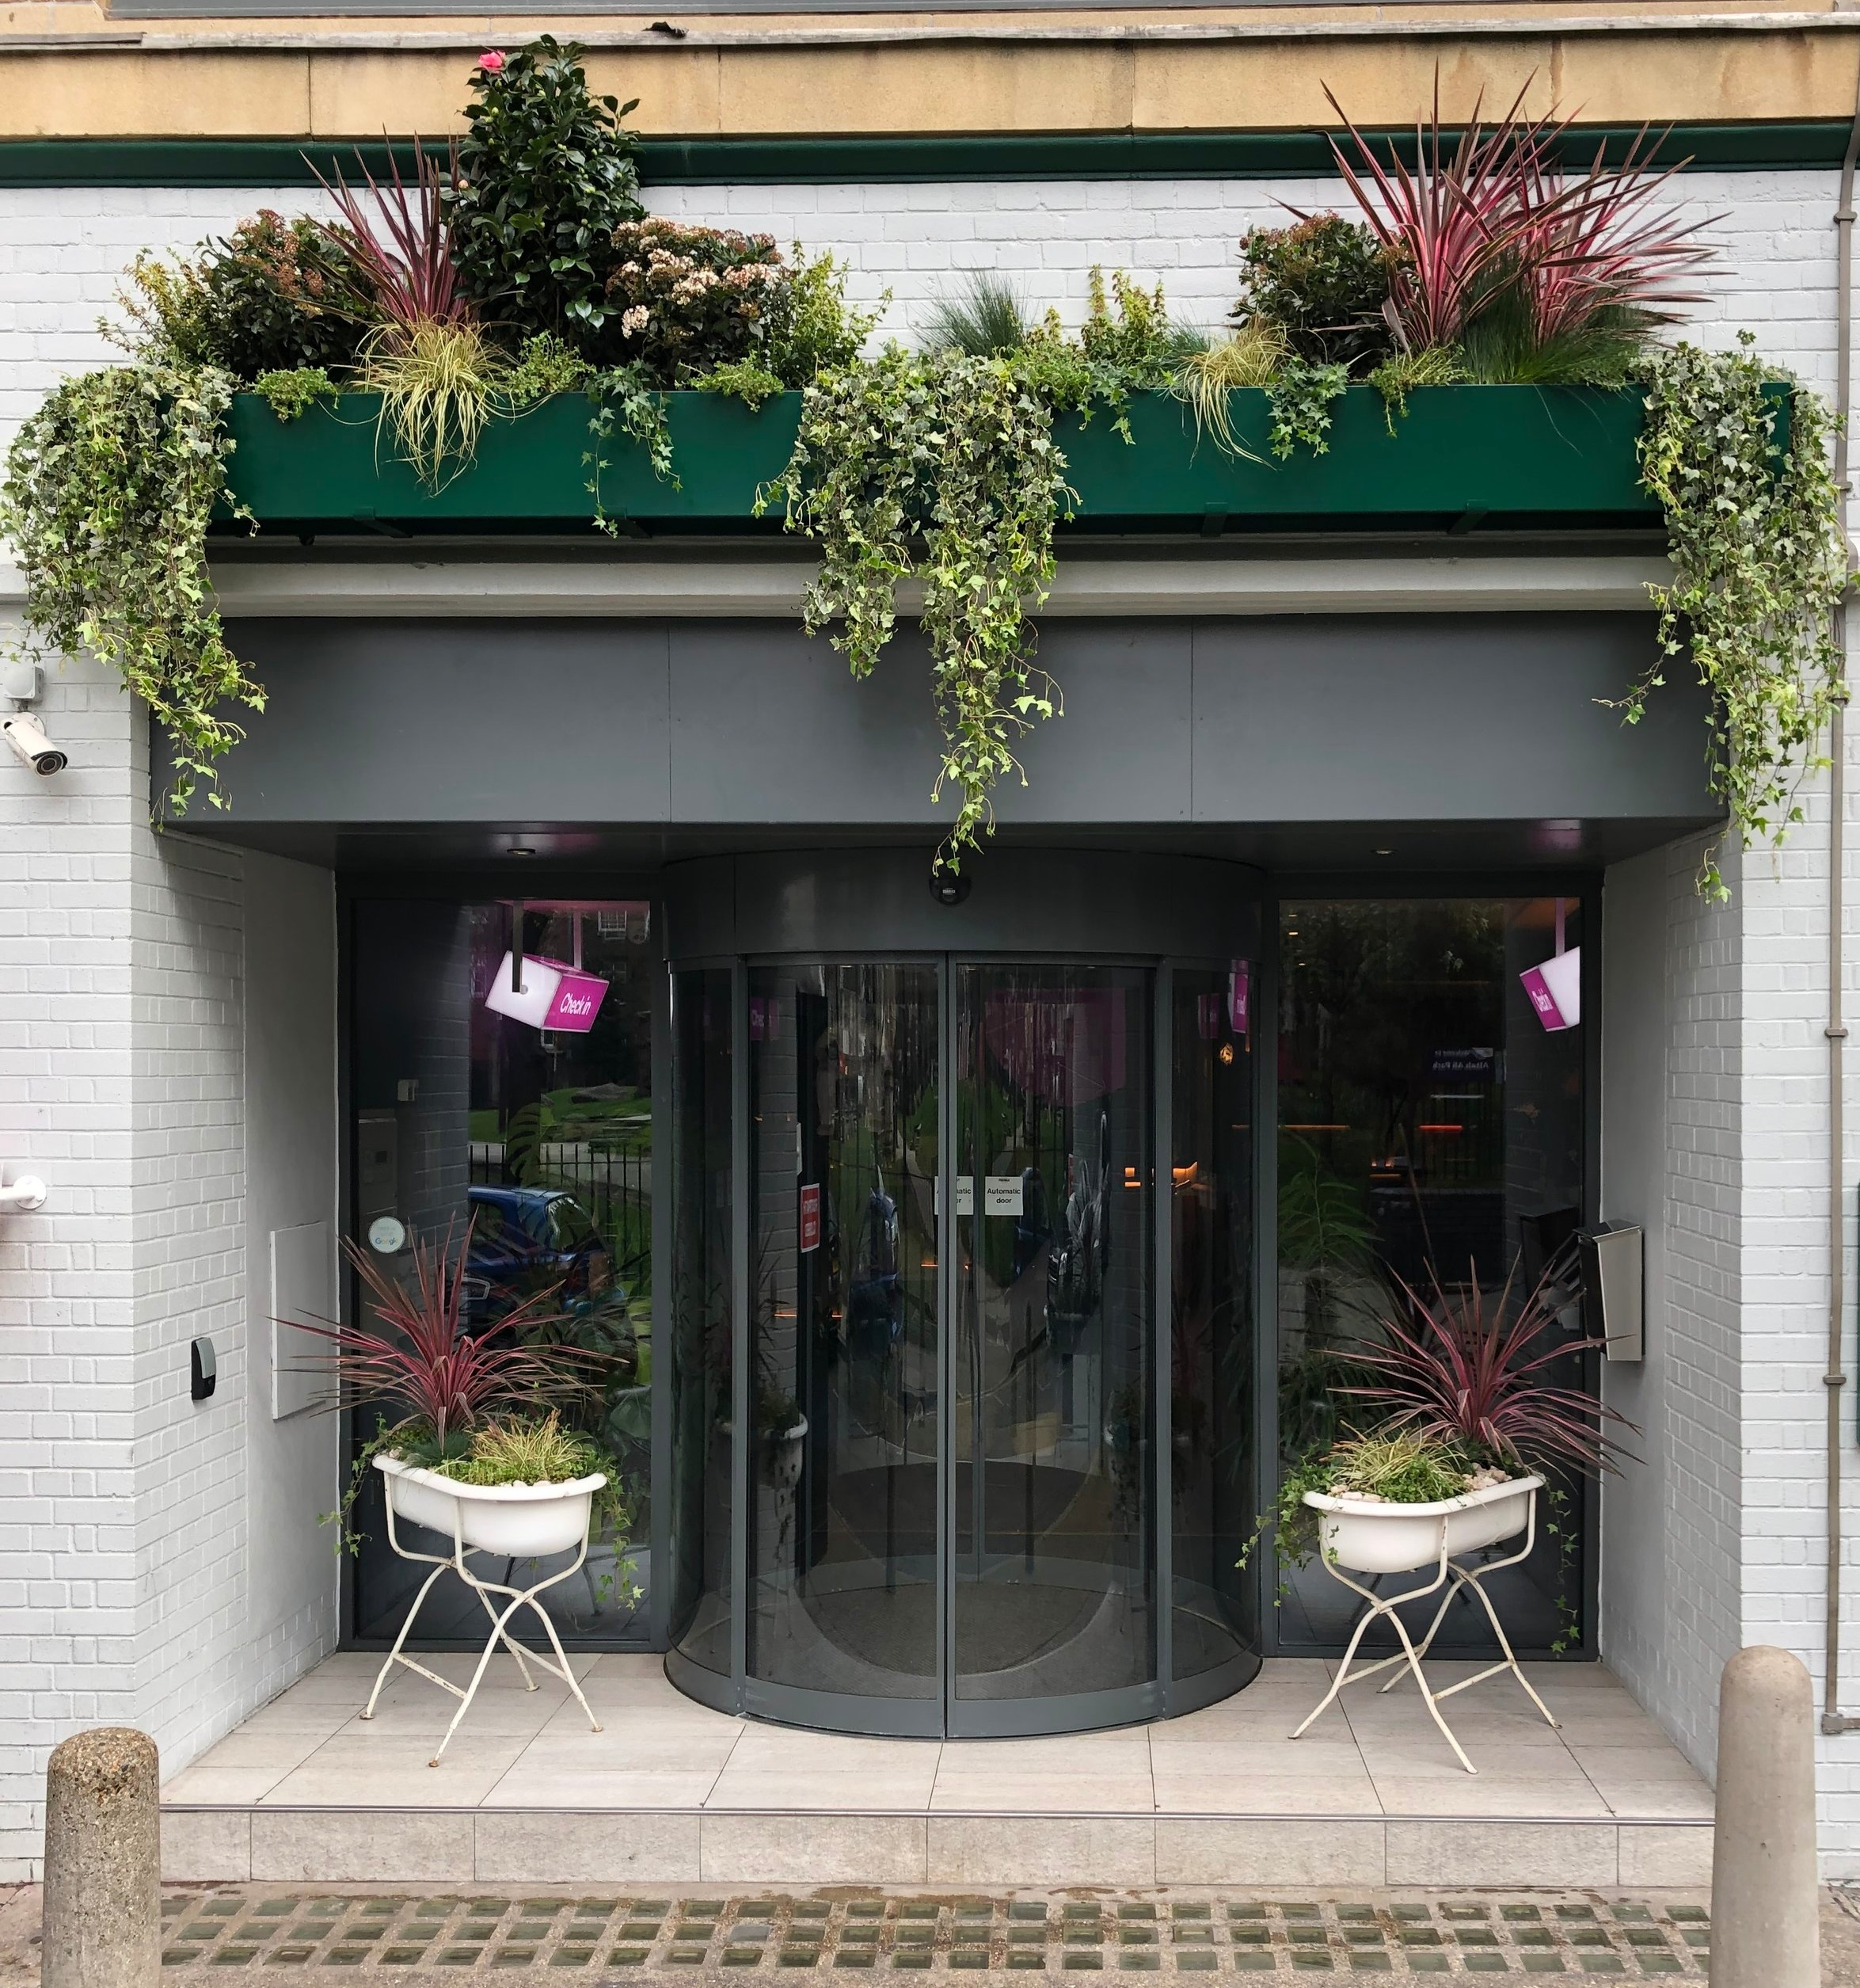 Exterior/Outdoor plant arrangement for QBIC hotels in Whitechapel, London.